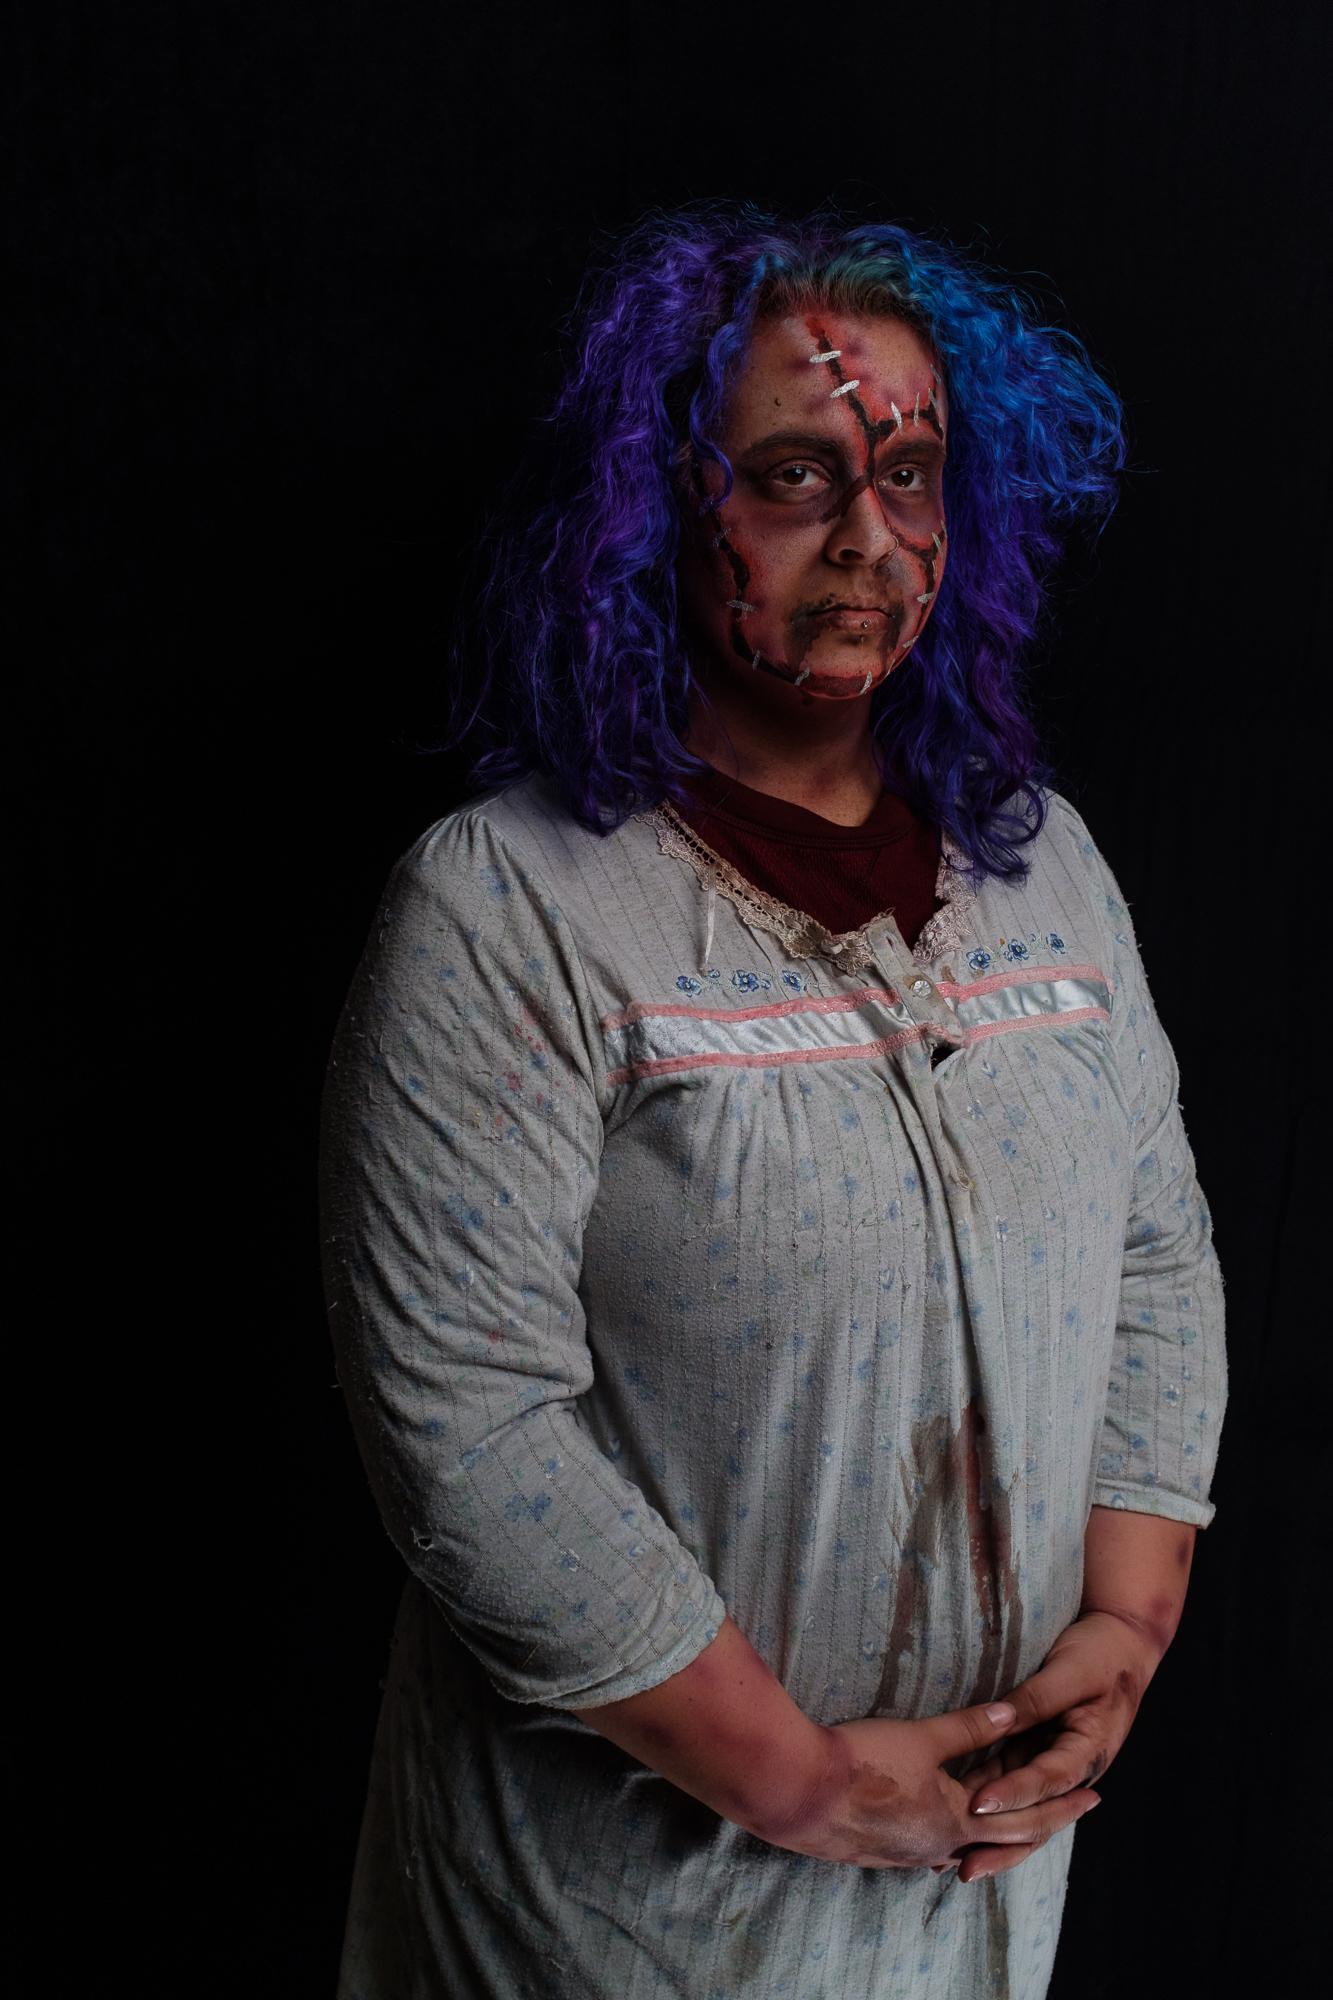 Photo By Danny Alexander  Makeup: Myself  Actress: Alyssa Hilger